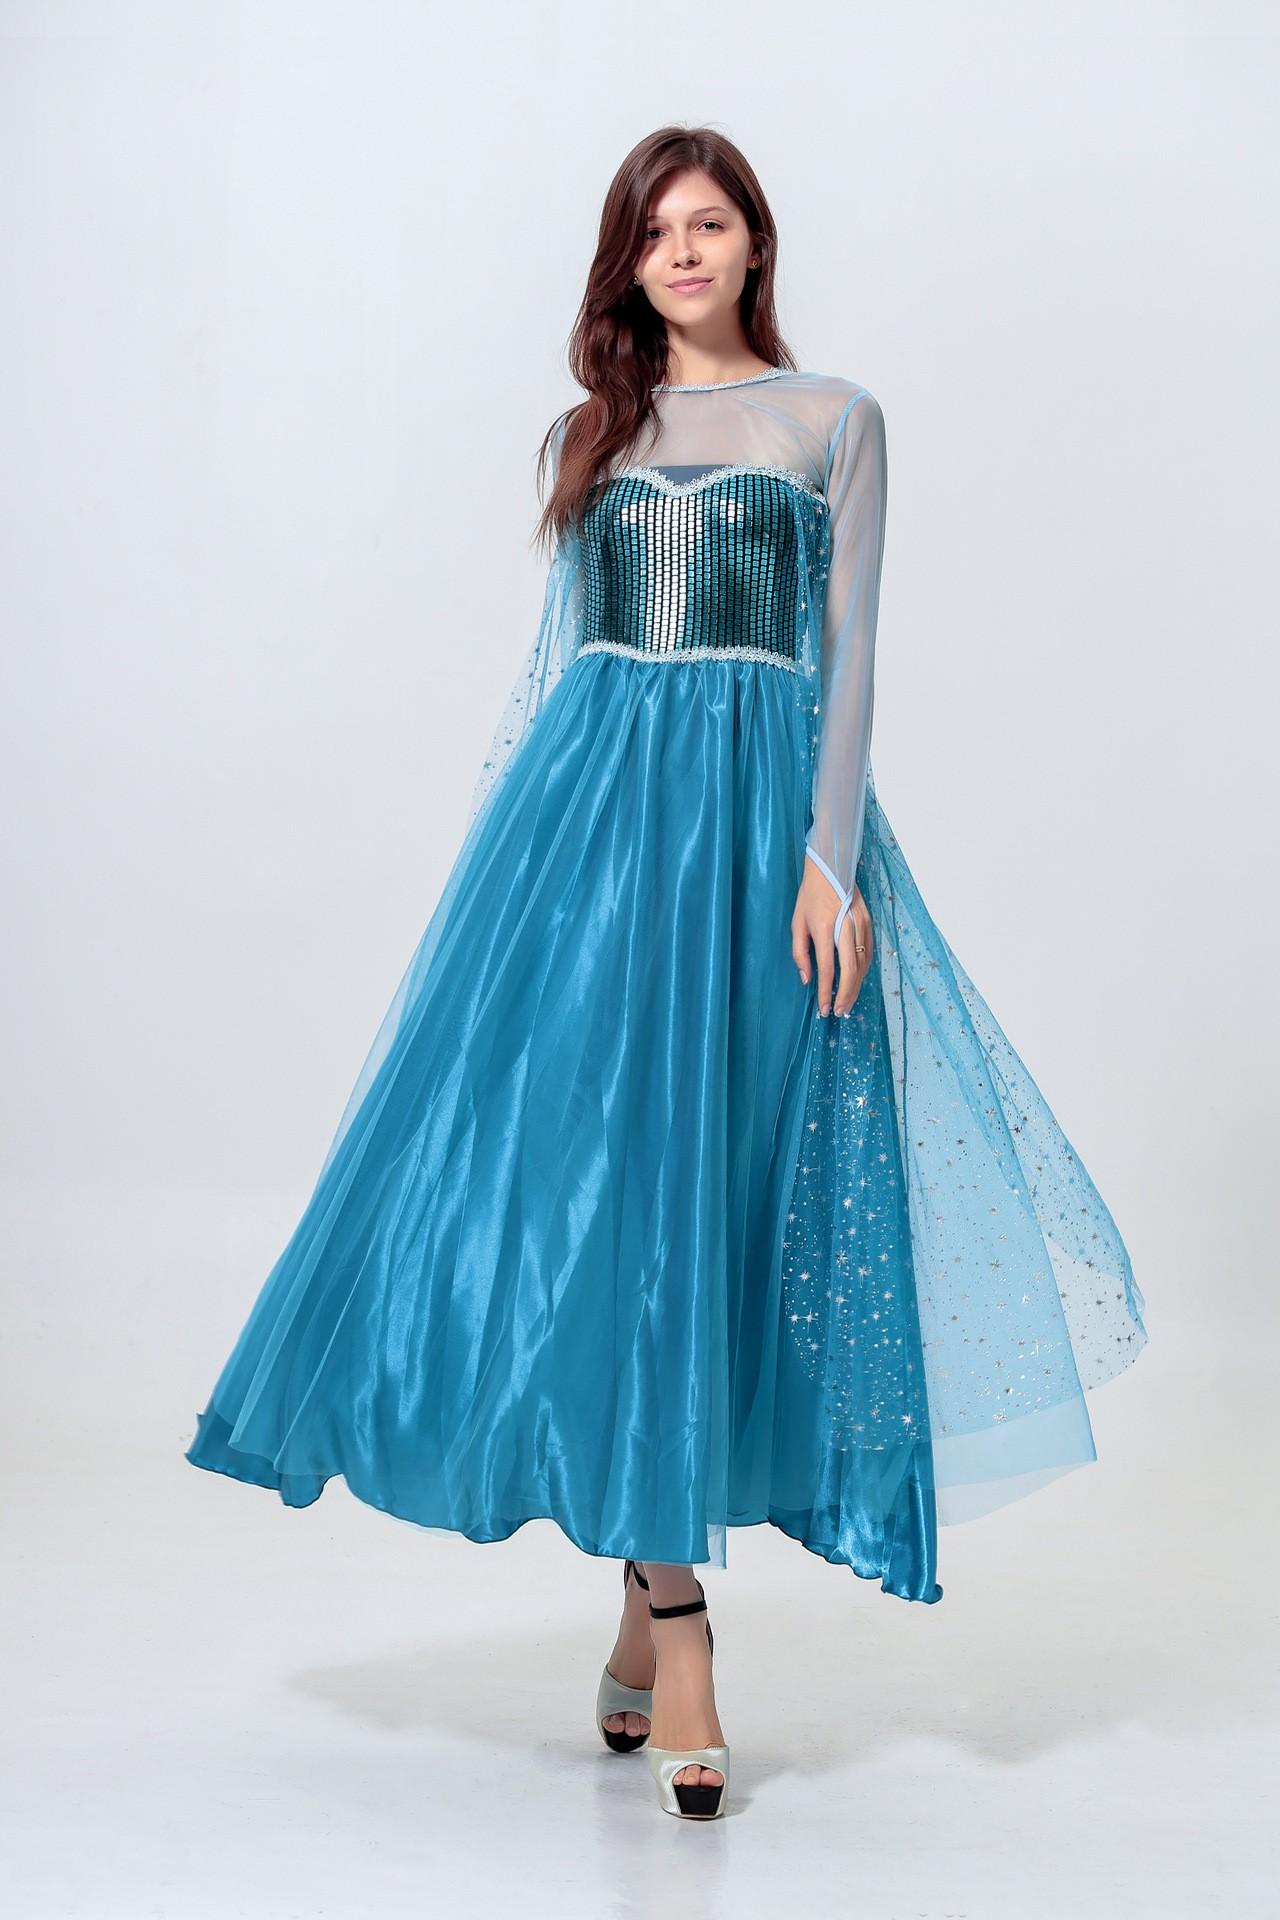 Sequin Frozen Prinsesse Elsa Kjole Voksen